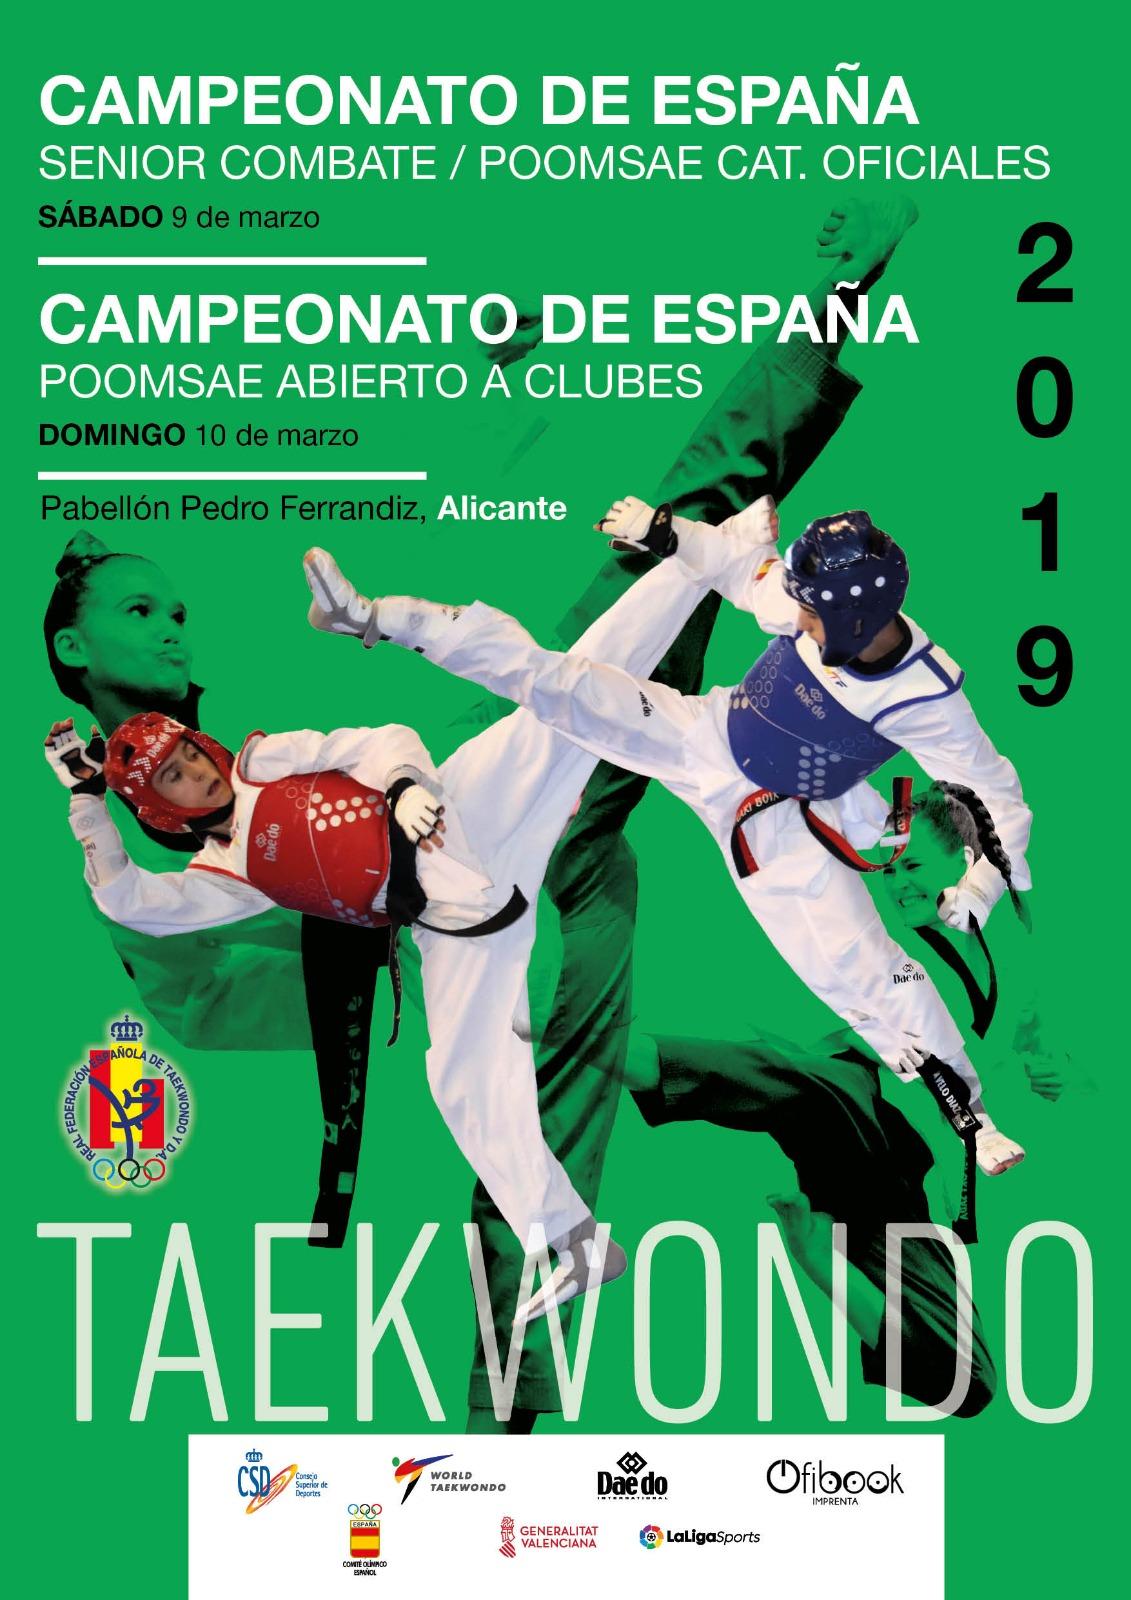 20190309_Campeonato-Espana-Absoluto_Poster